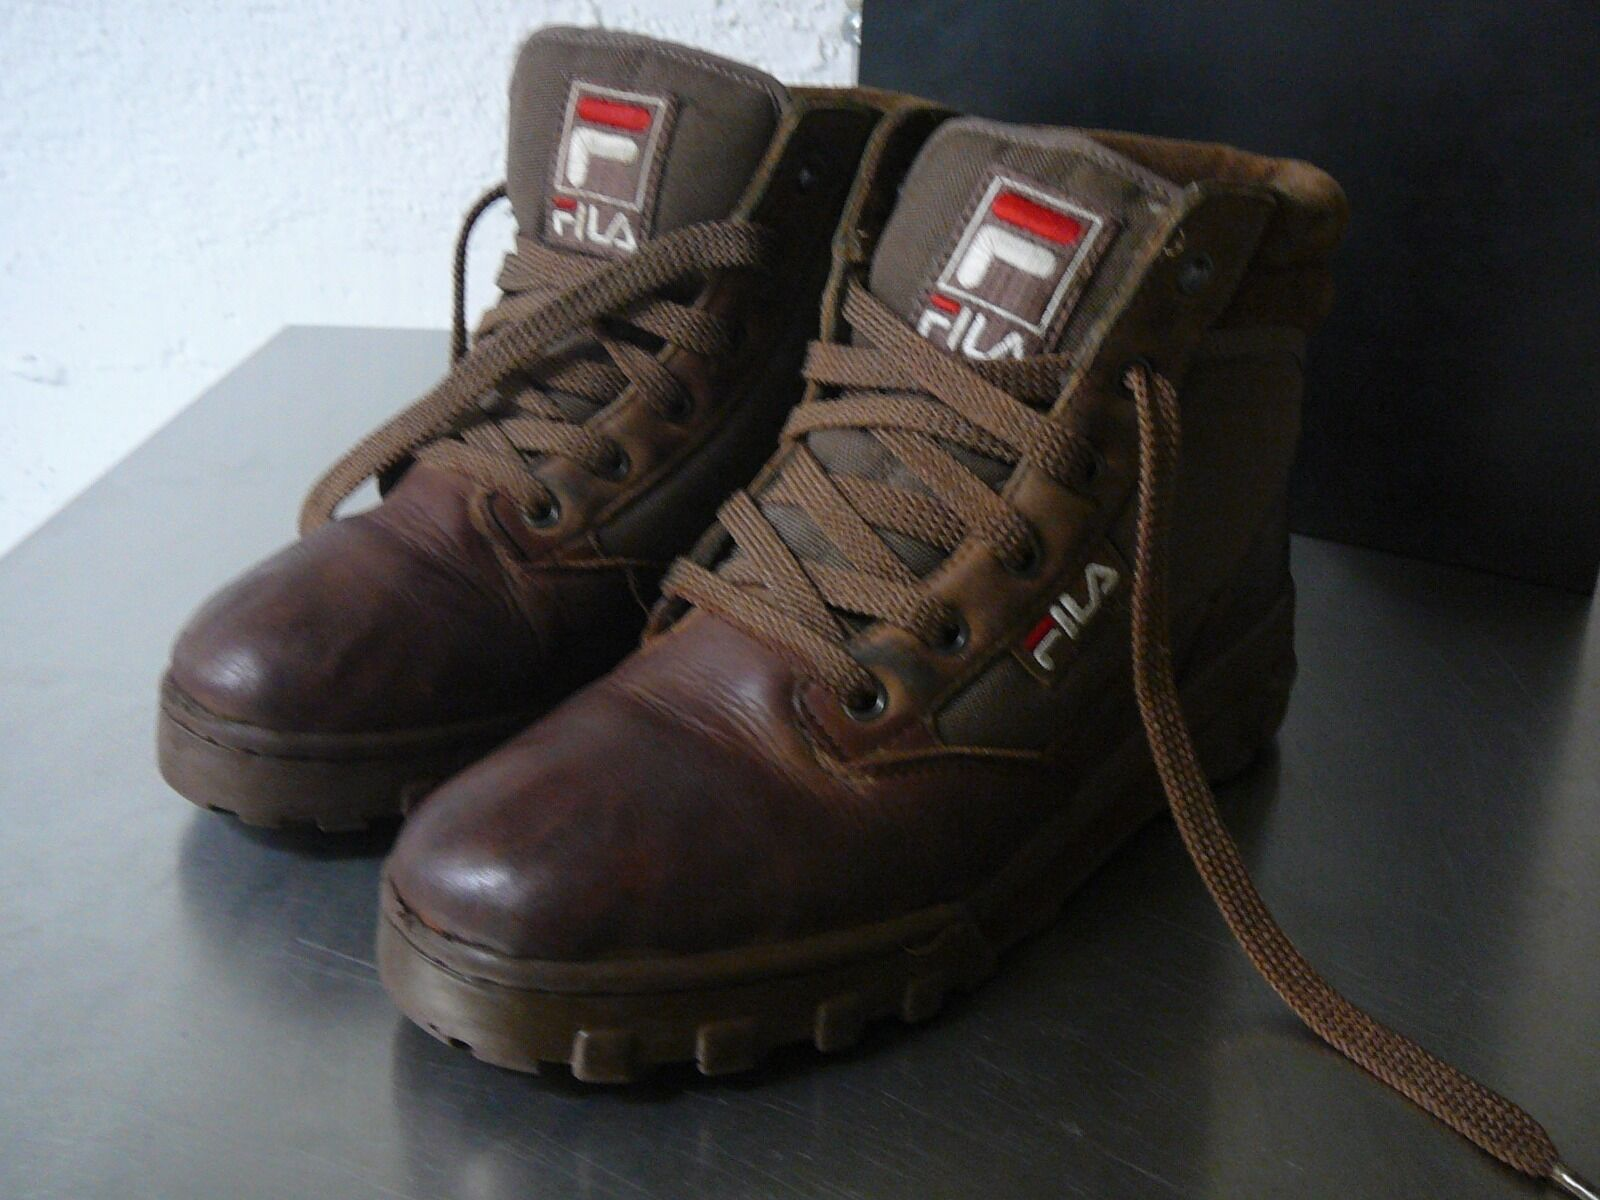 Fila vintage Trekking Boots UK 7.5